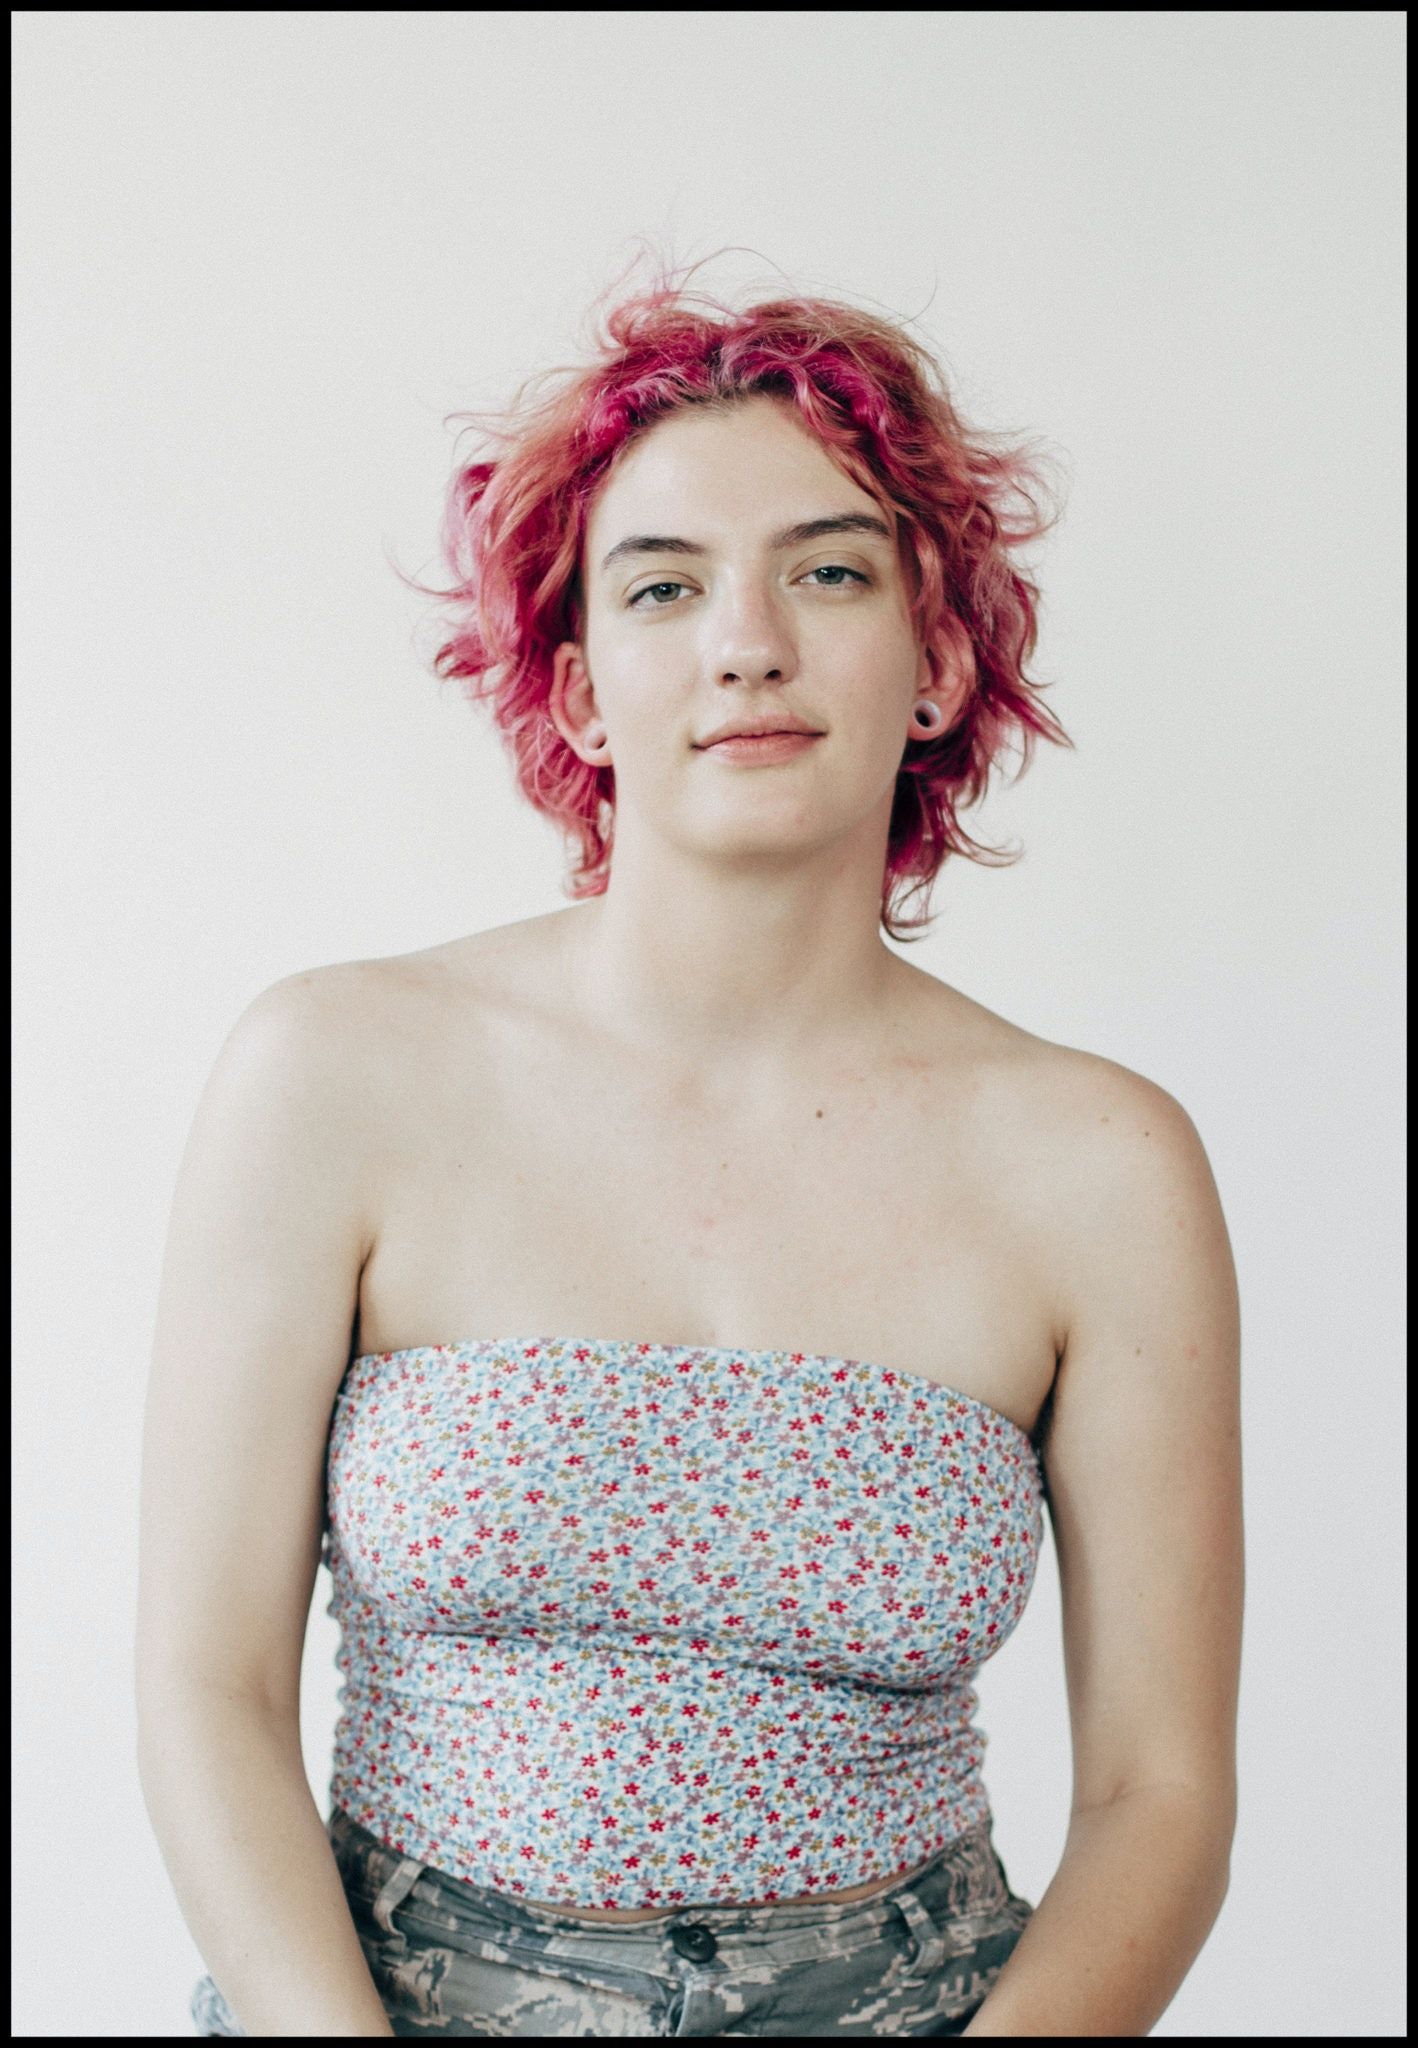 Cori Corinne